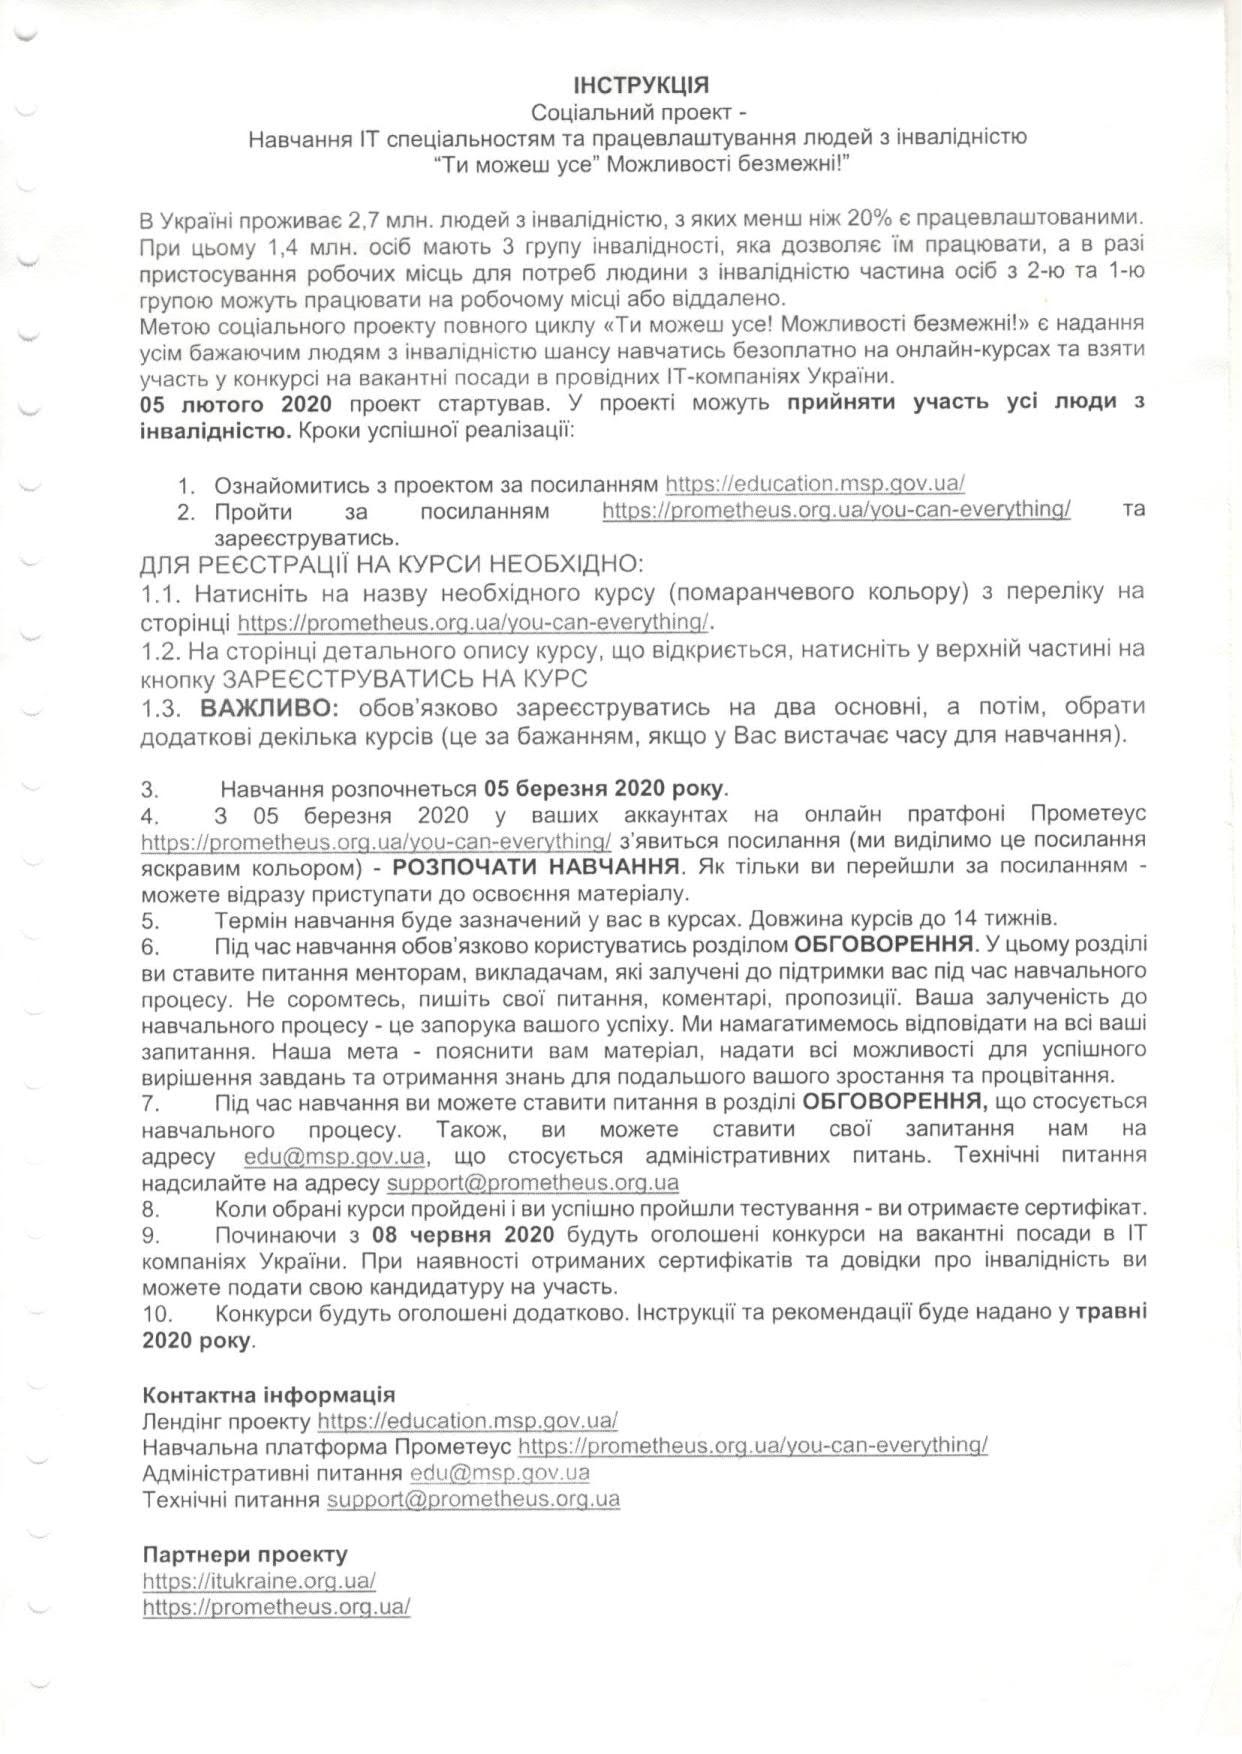 Соц. проєкт (додатки)_5